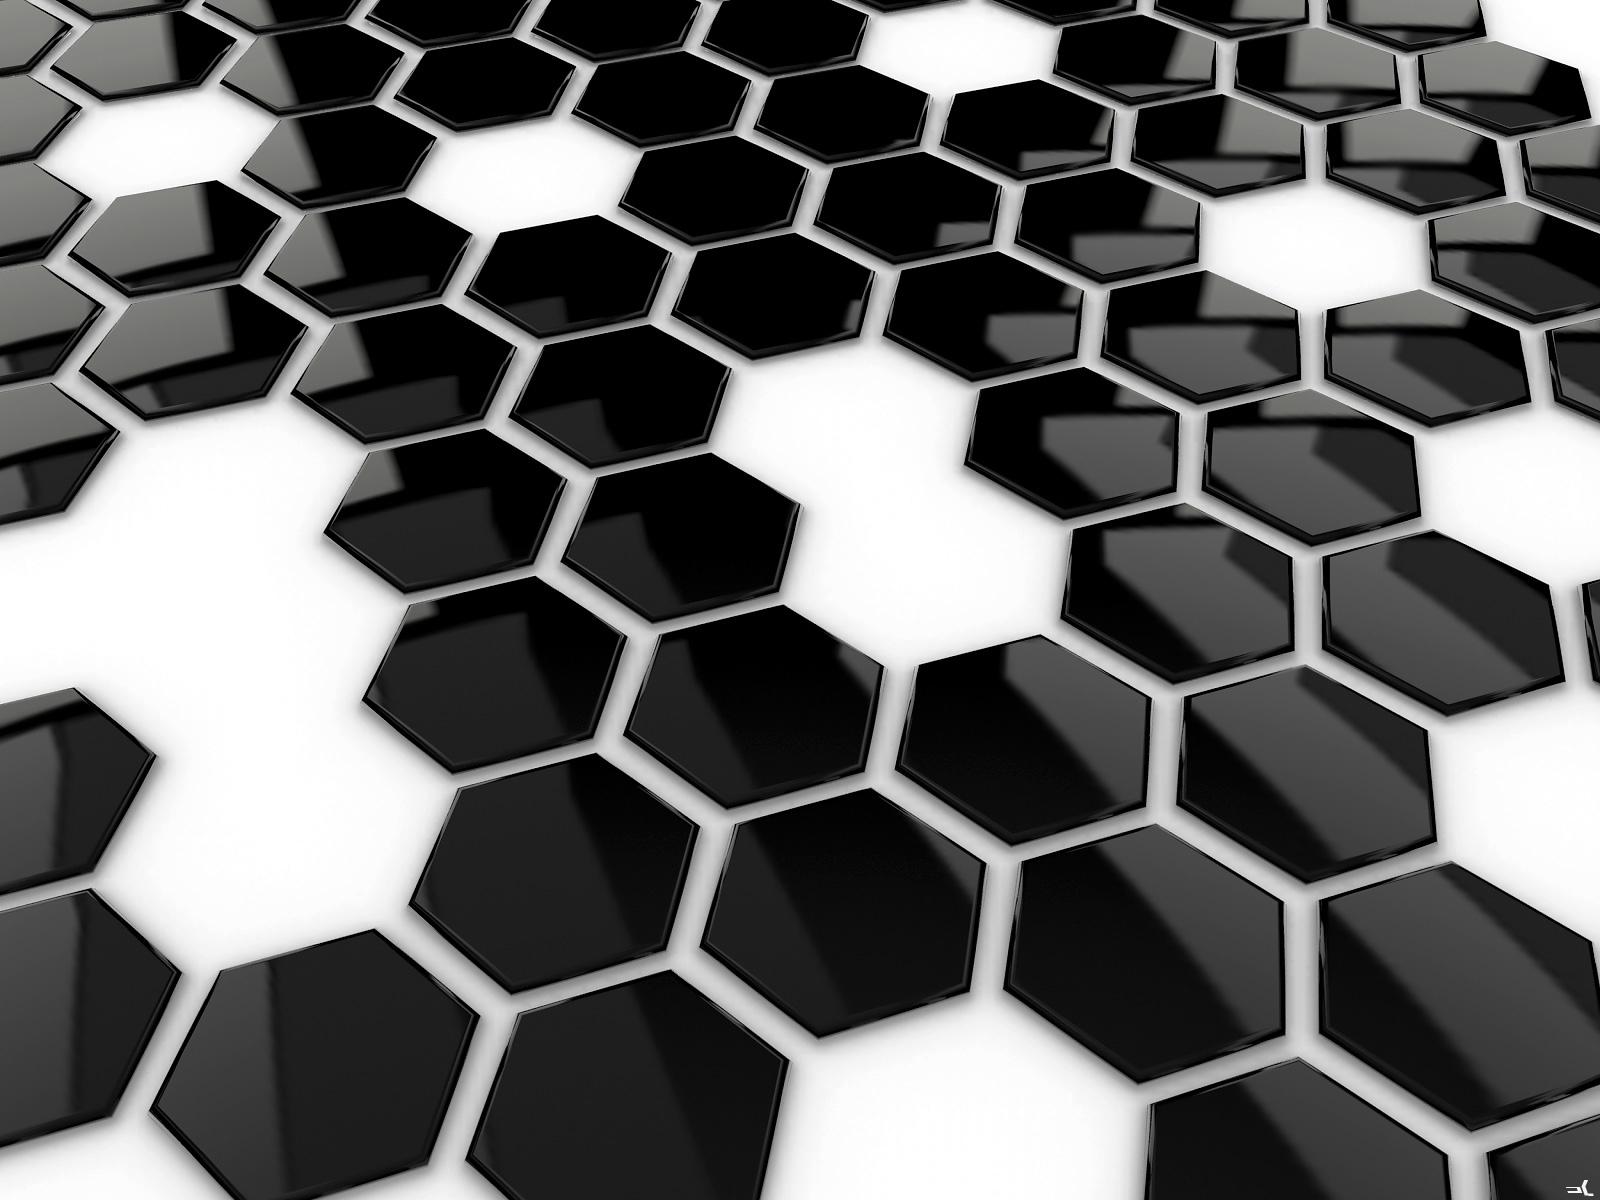 Fonds D'écran Abstrait Noir Et Blanc - MaximumWall